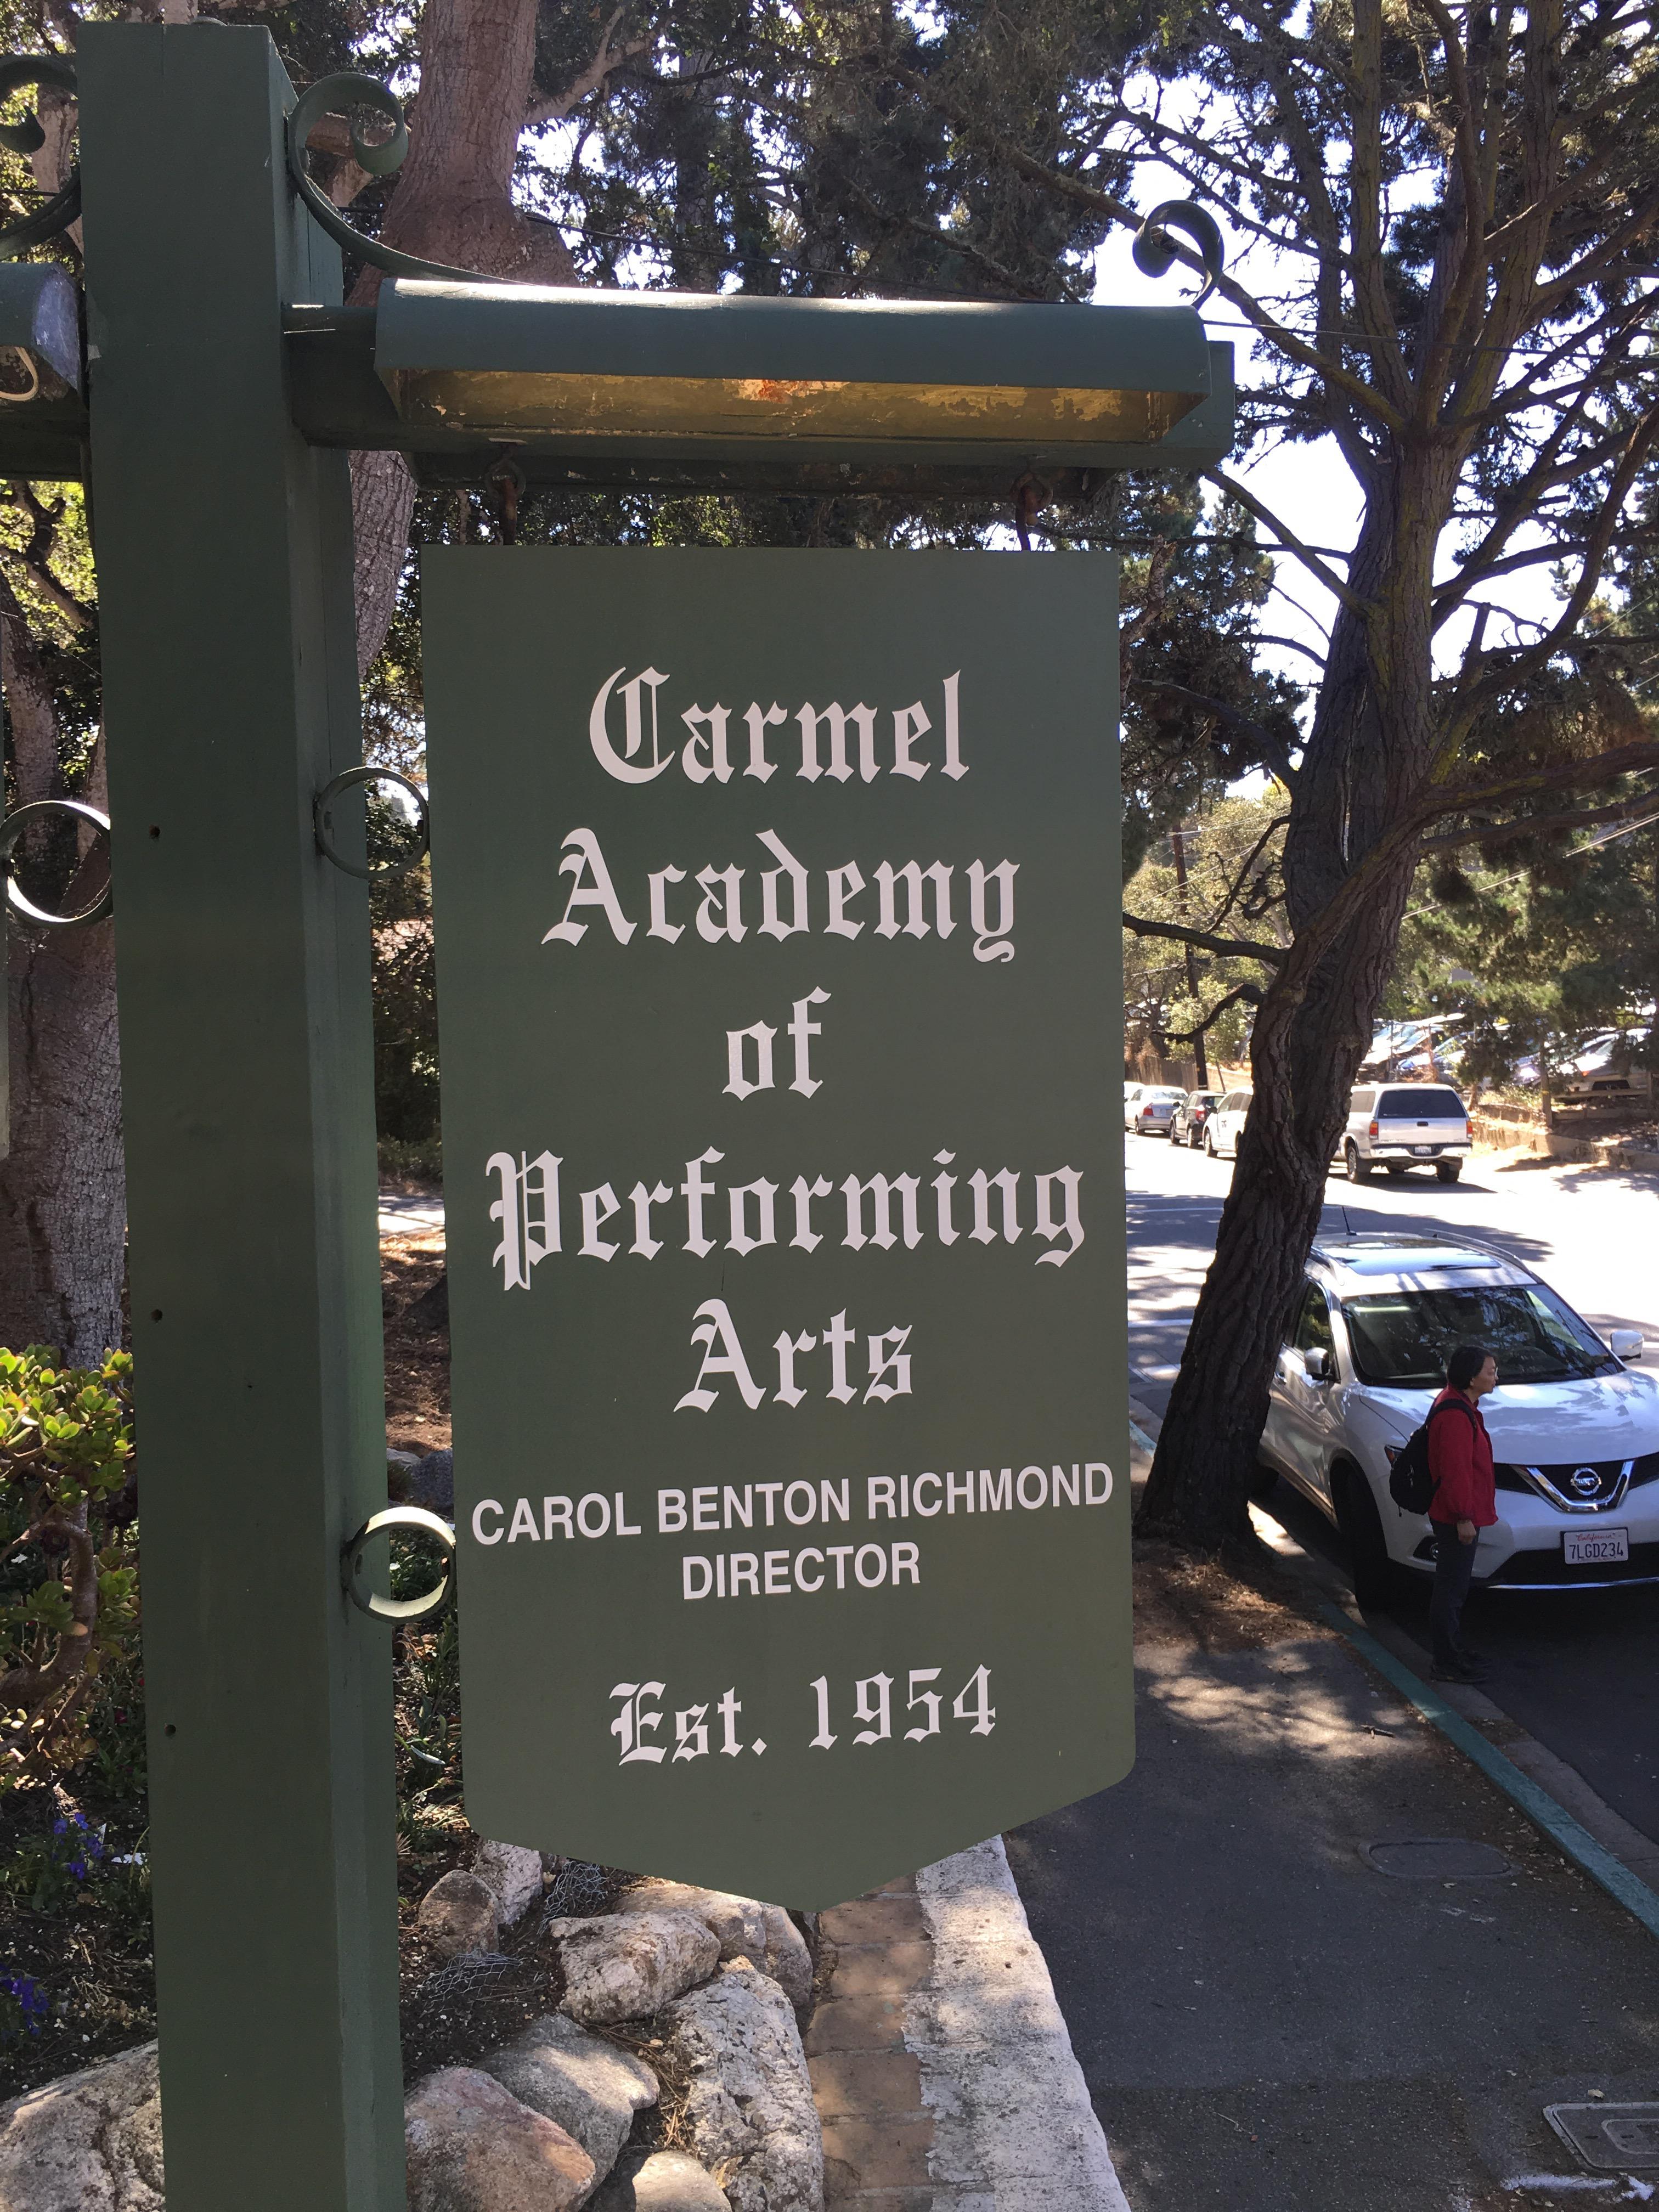 Carmel Academy Of Performing Arts